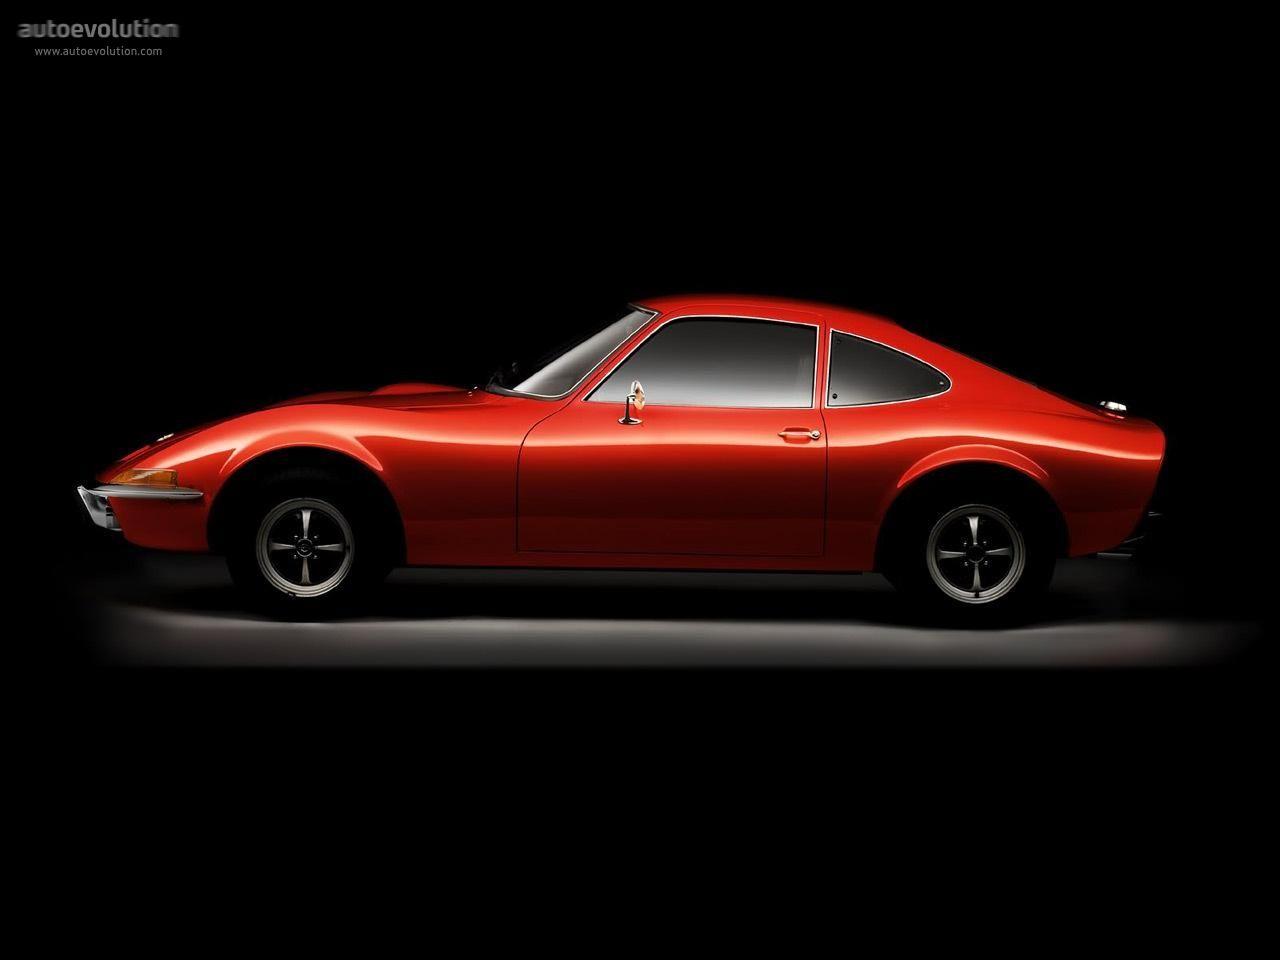 Opel Gt 1968 1969 1970 1971 1972 1973 Autoevolution